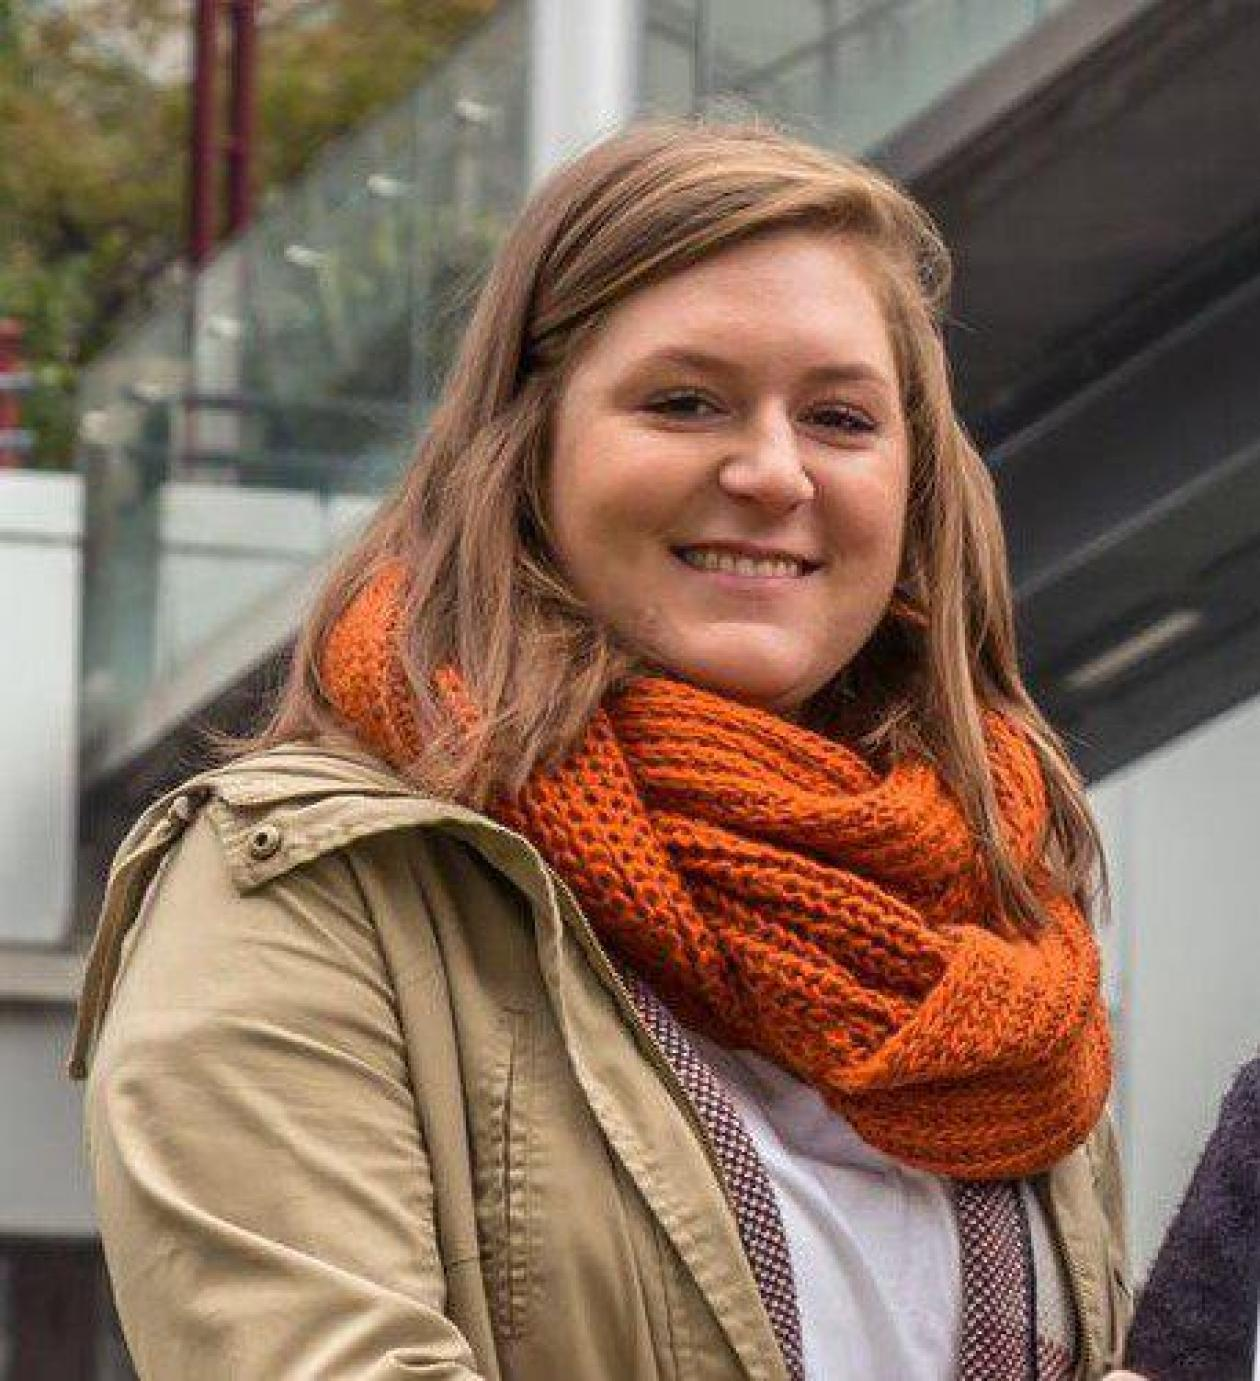 Daniela Kitzmantl